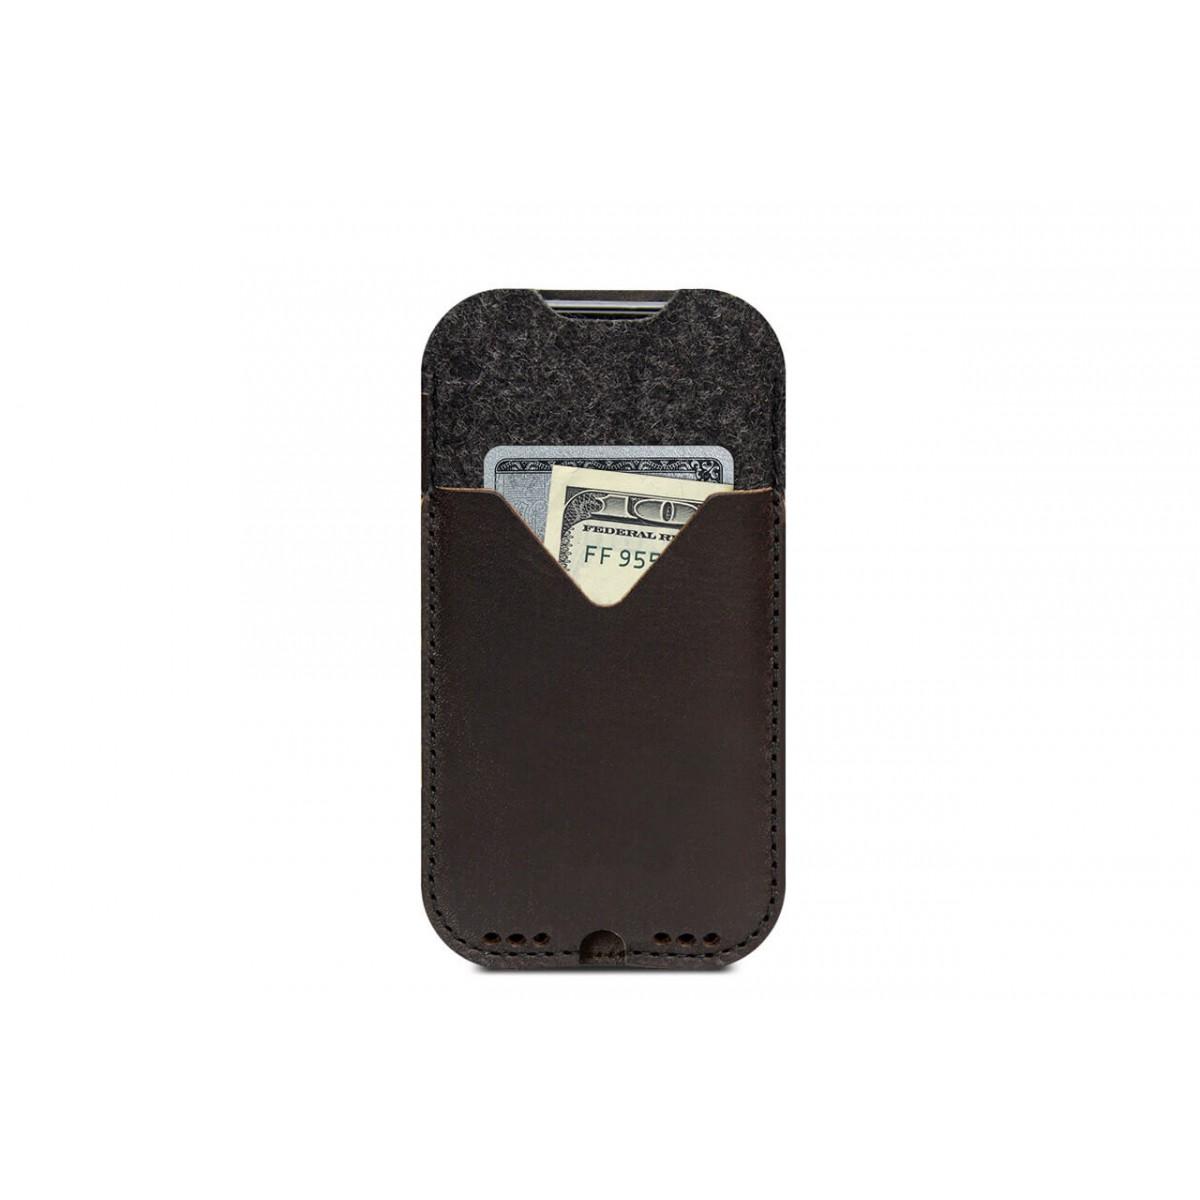 iPhone 12 Pro Handyhülle KIRKBY Vegetabil gegerbtes Leder und 100% Merino Wollfilz (Mulesing-frei)